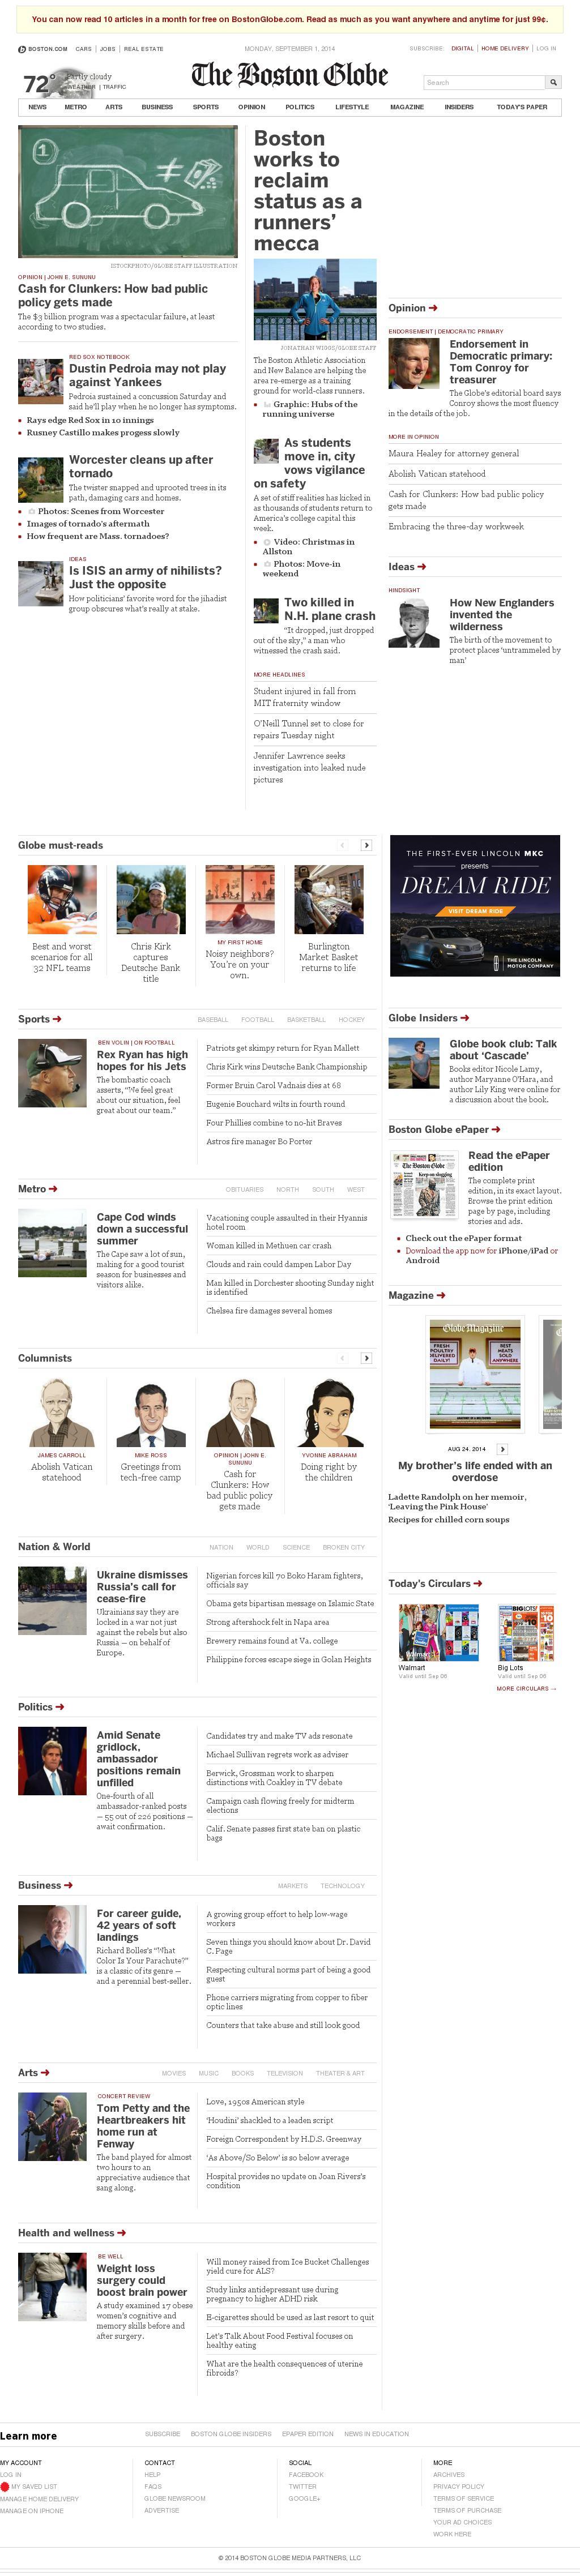 The Boston Globe at Tuesday Sept. 2, 2014, 12:01 a.m. UTC